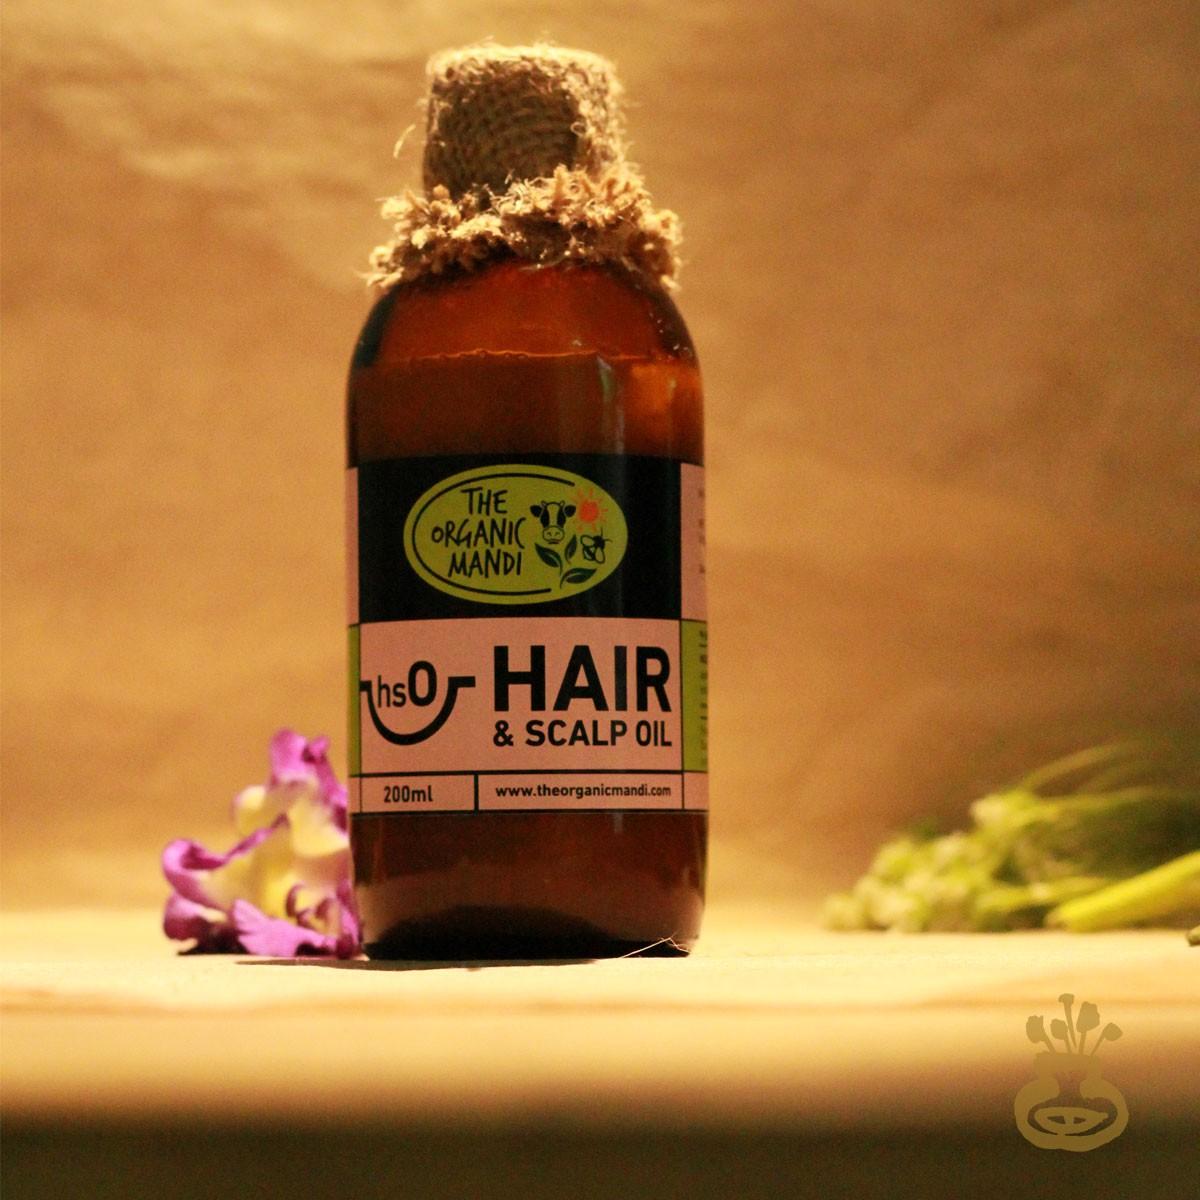 Hair and Scalp Oil (200ml)